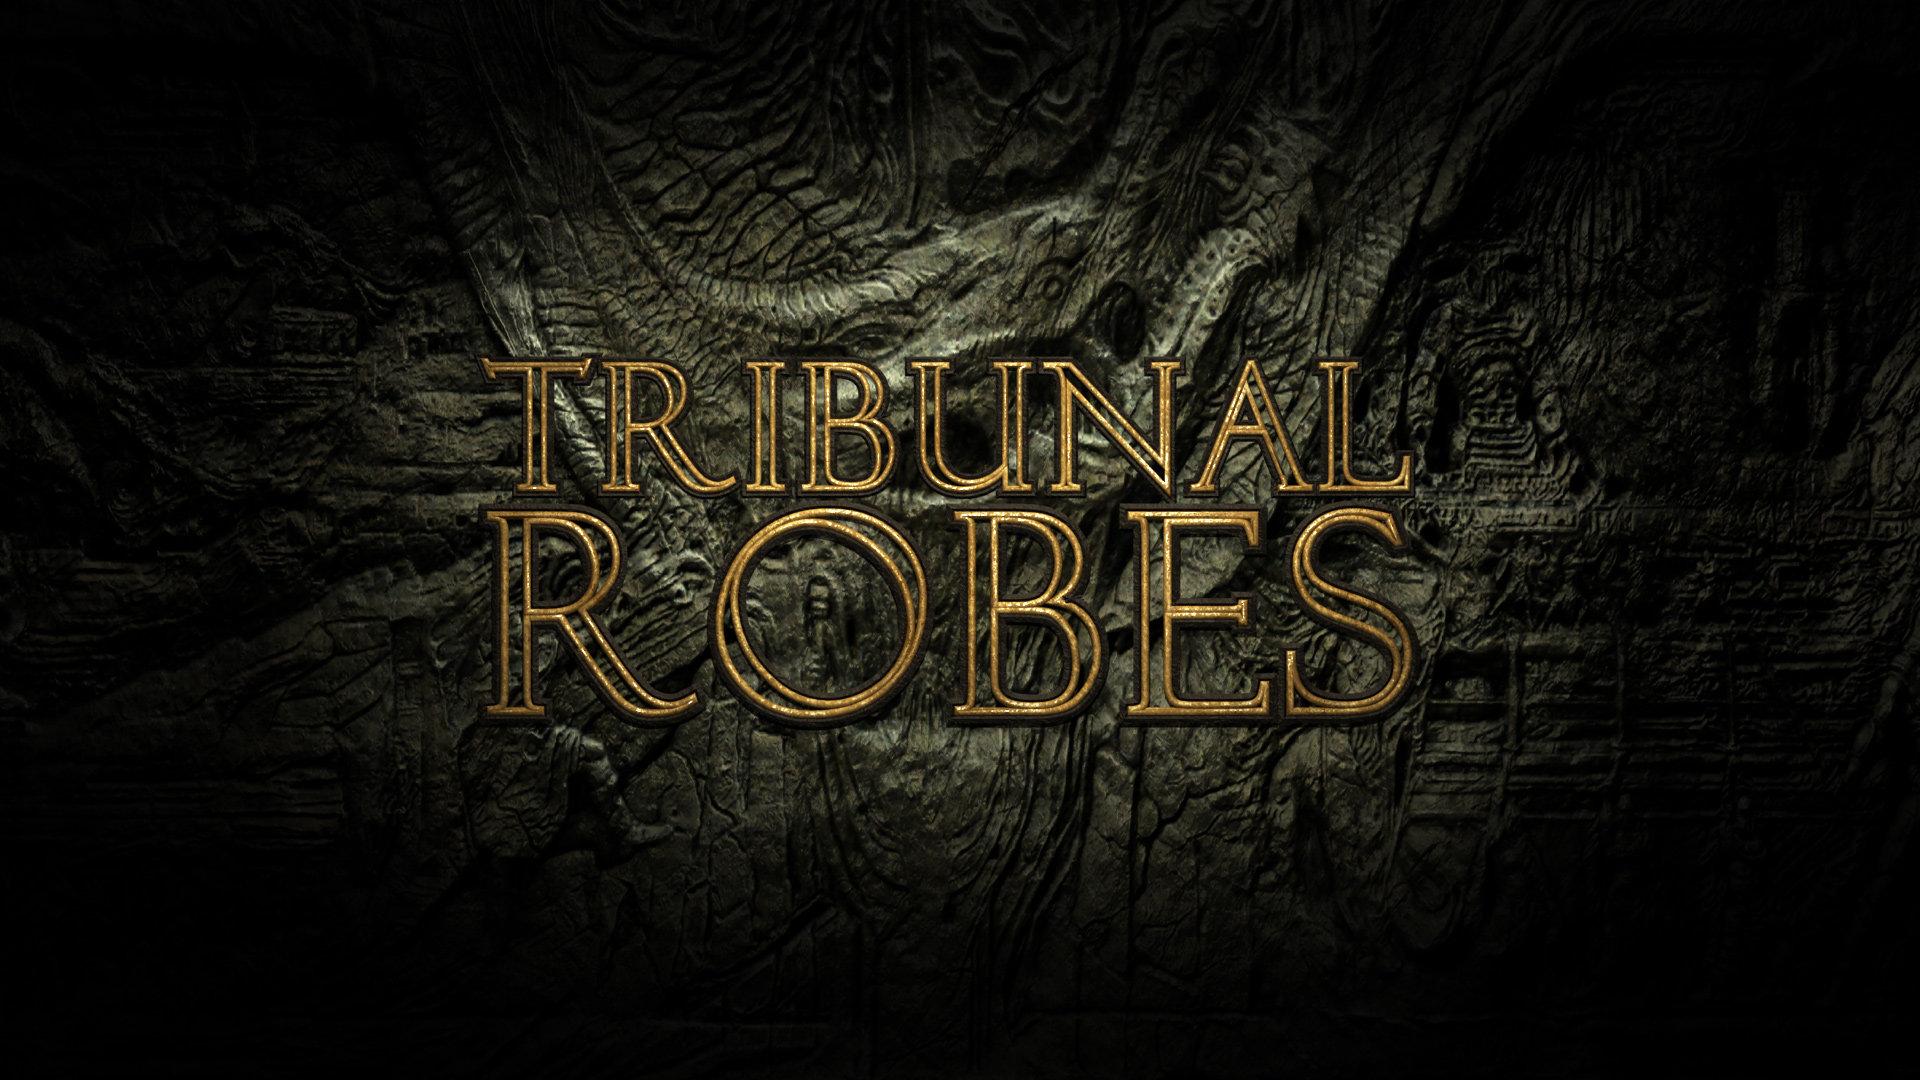 Thomas veyrat 02 tribunalmod title